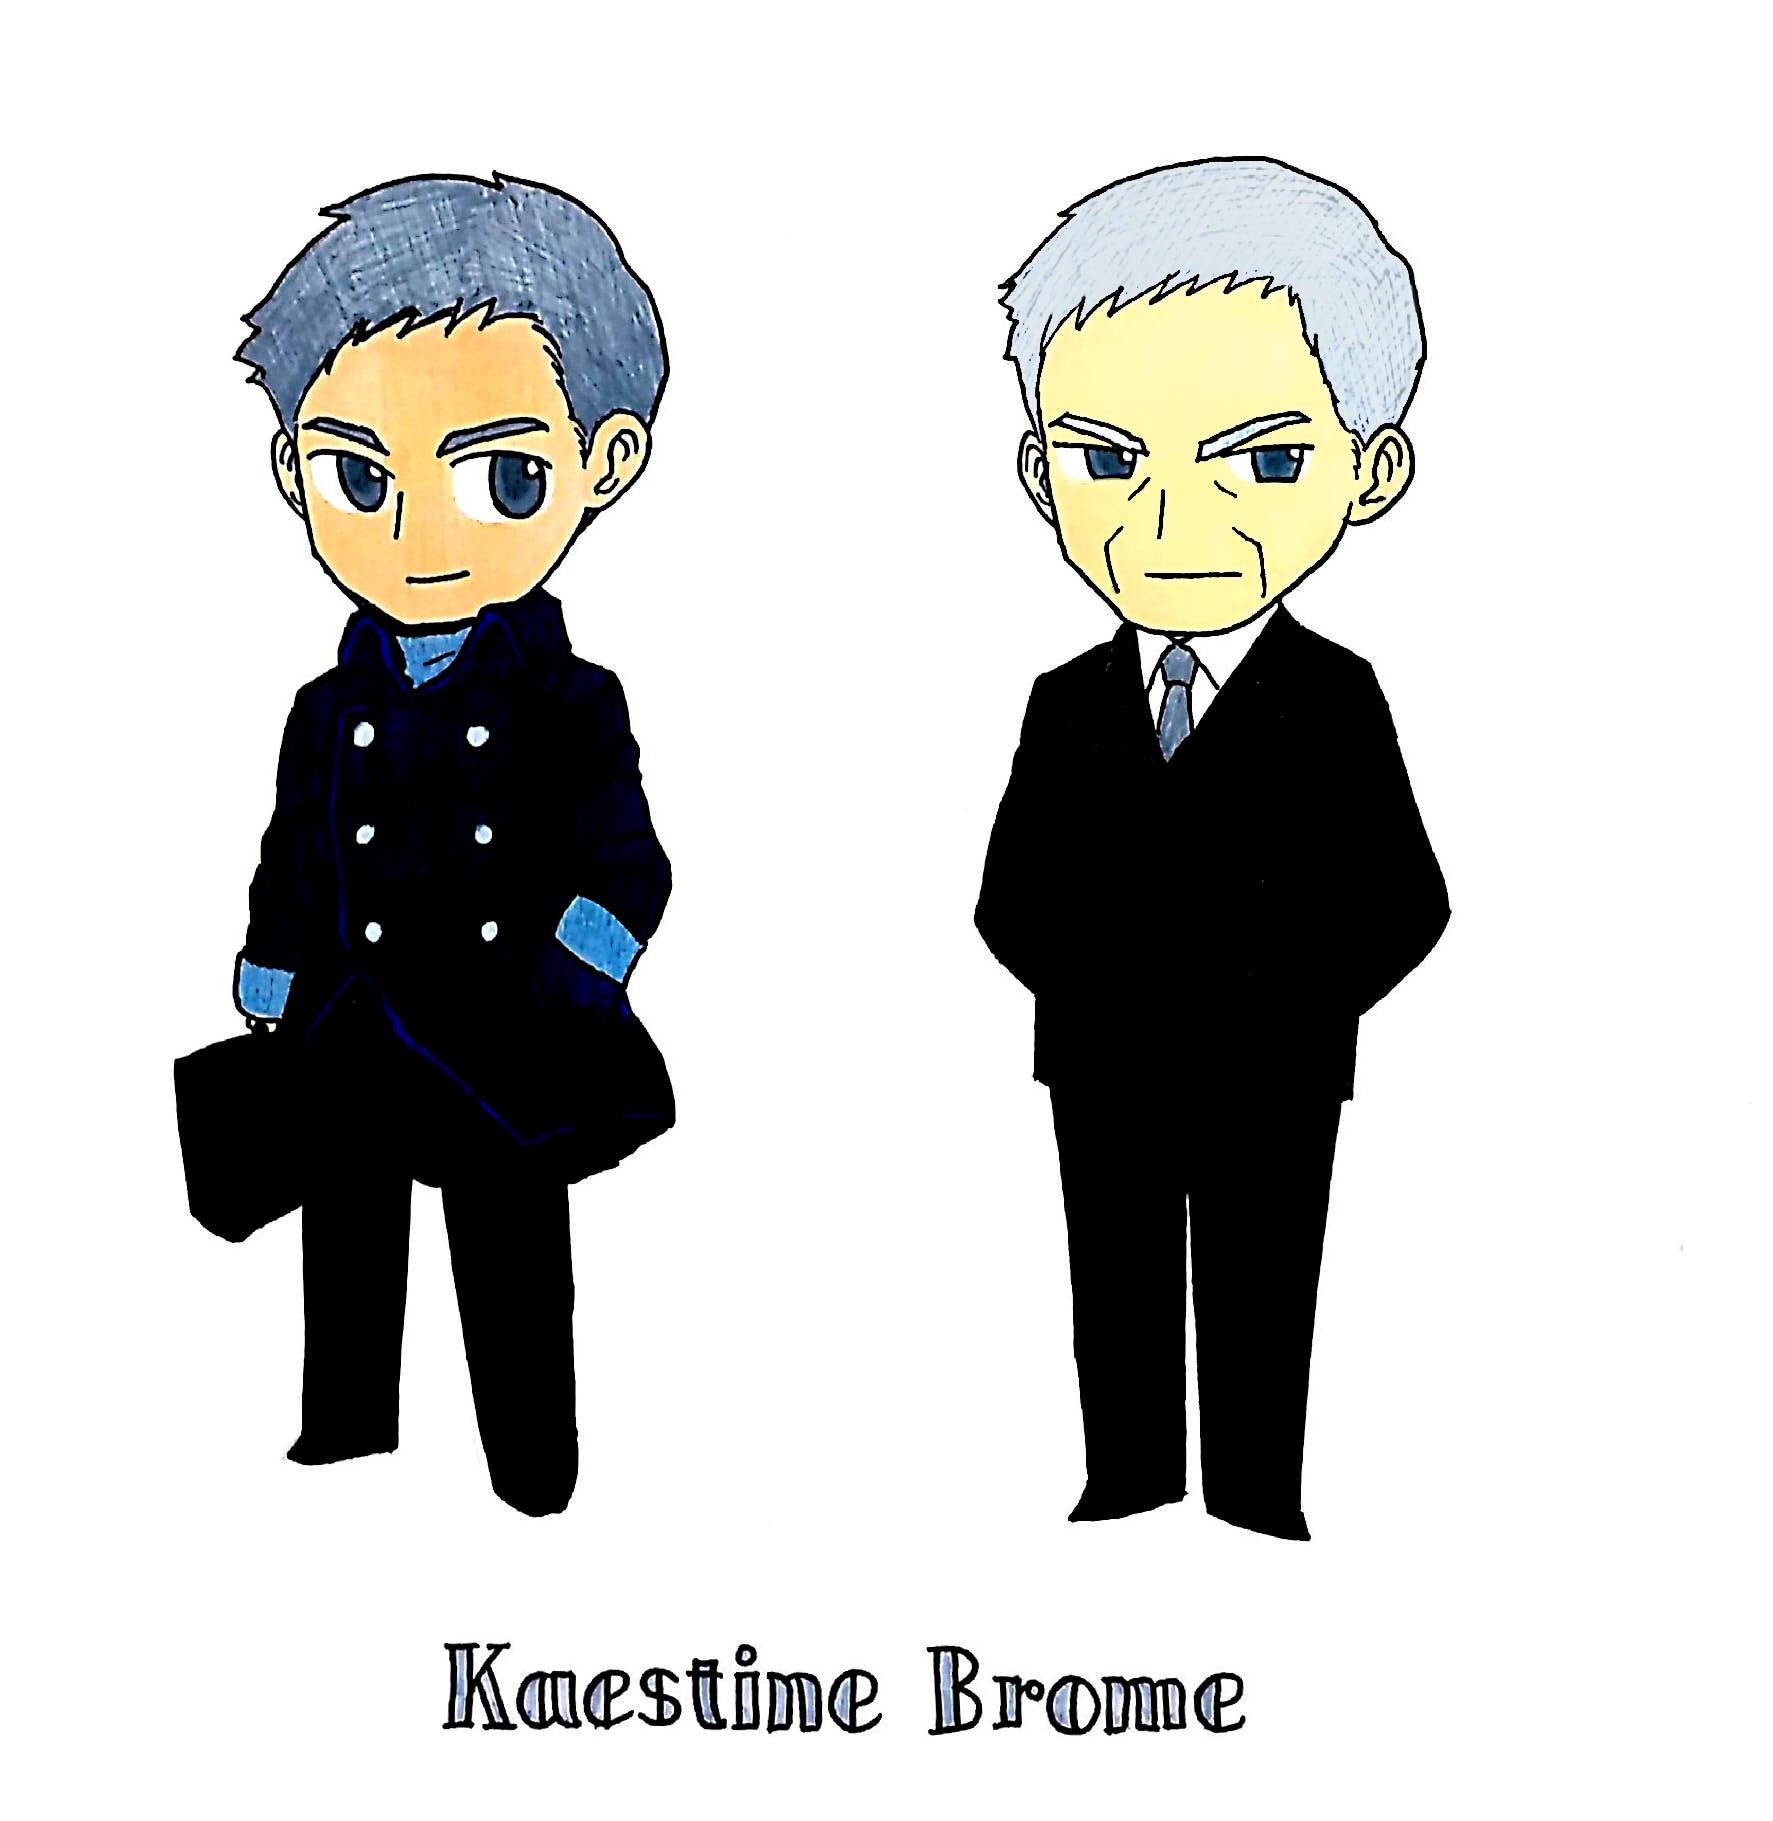 Kaestine_deformer.jpg